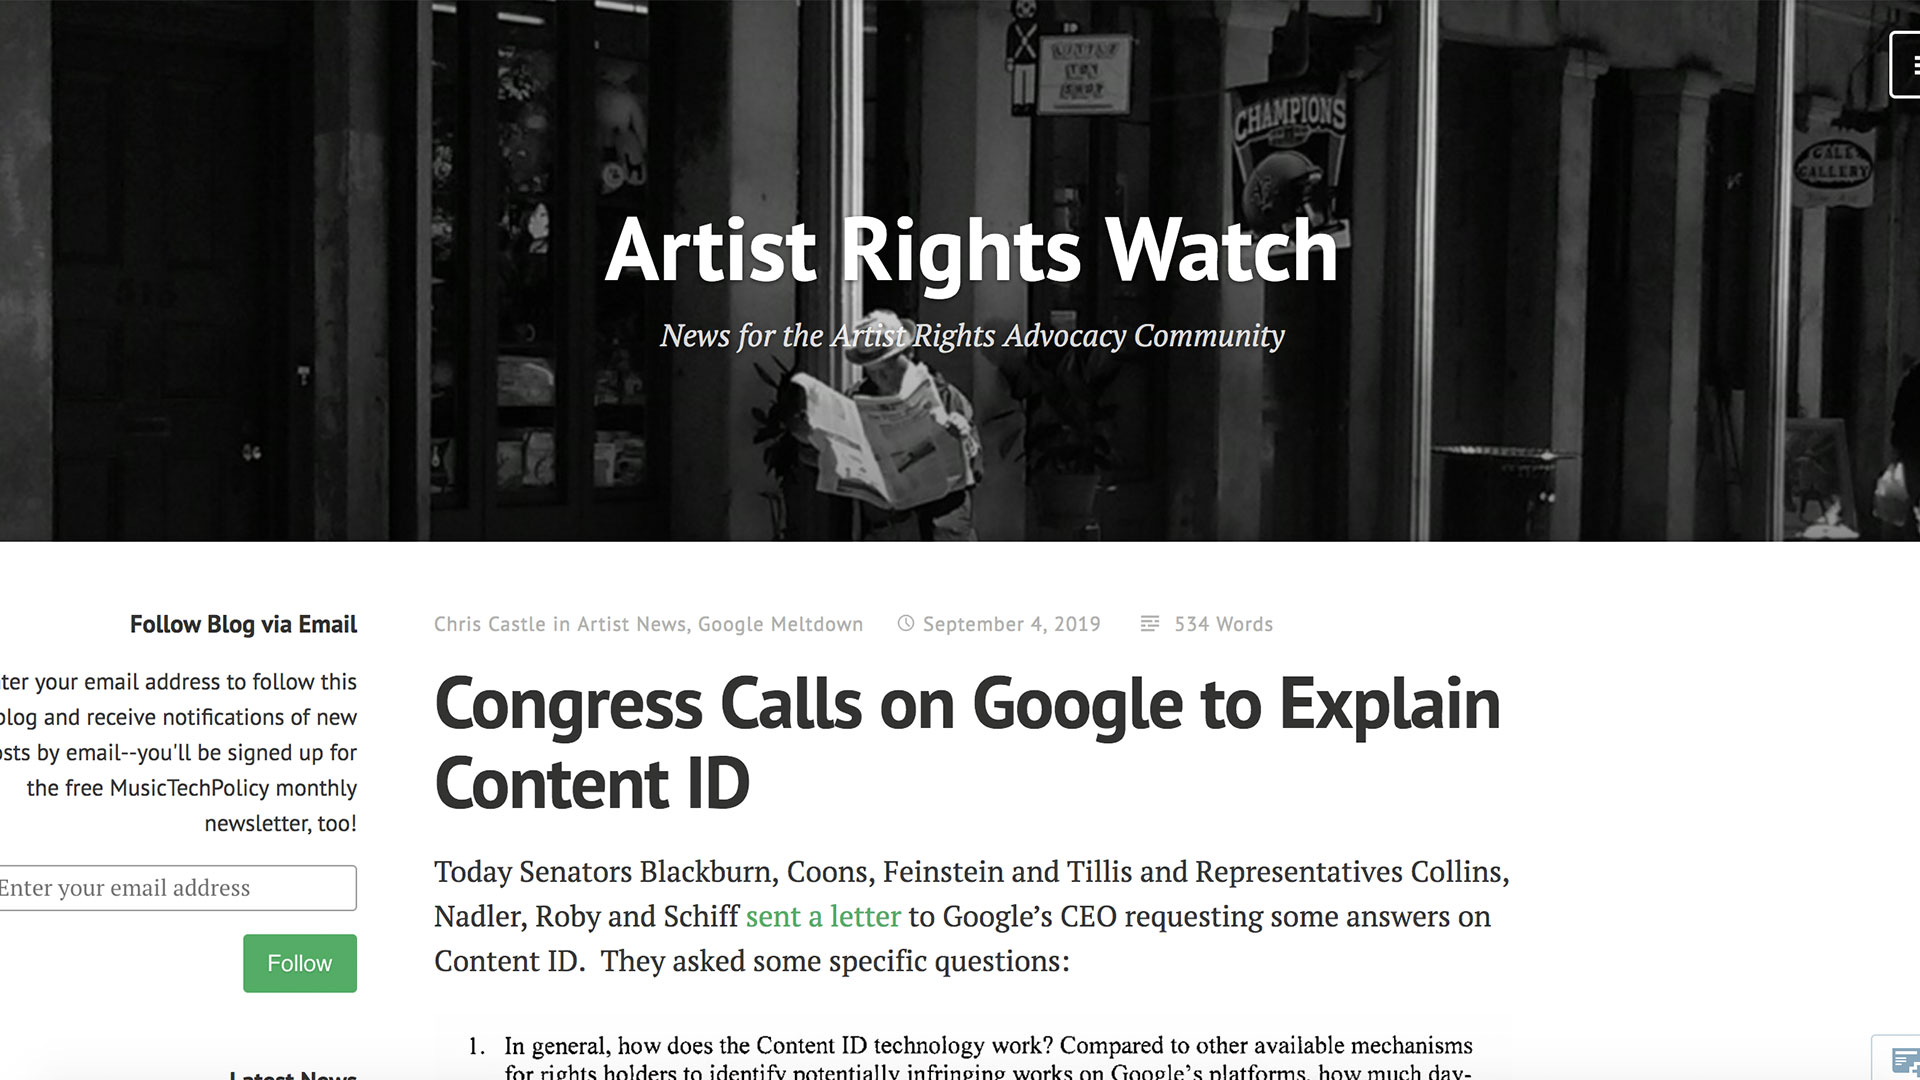 Fairness Rocks News Congress Calls on Google to Explain Content ID